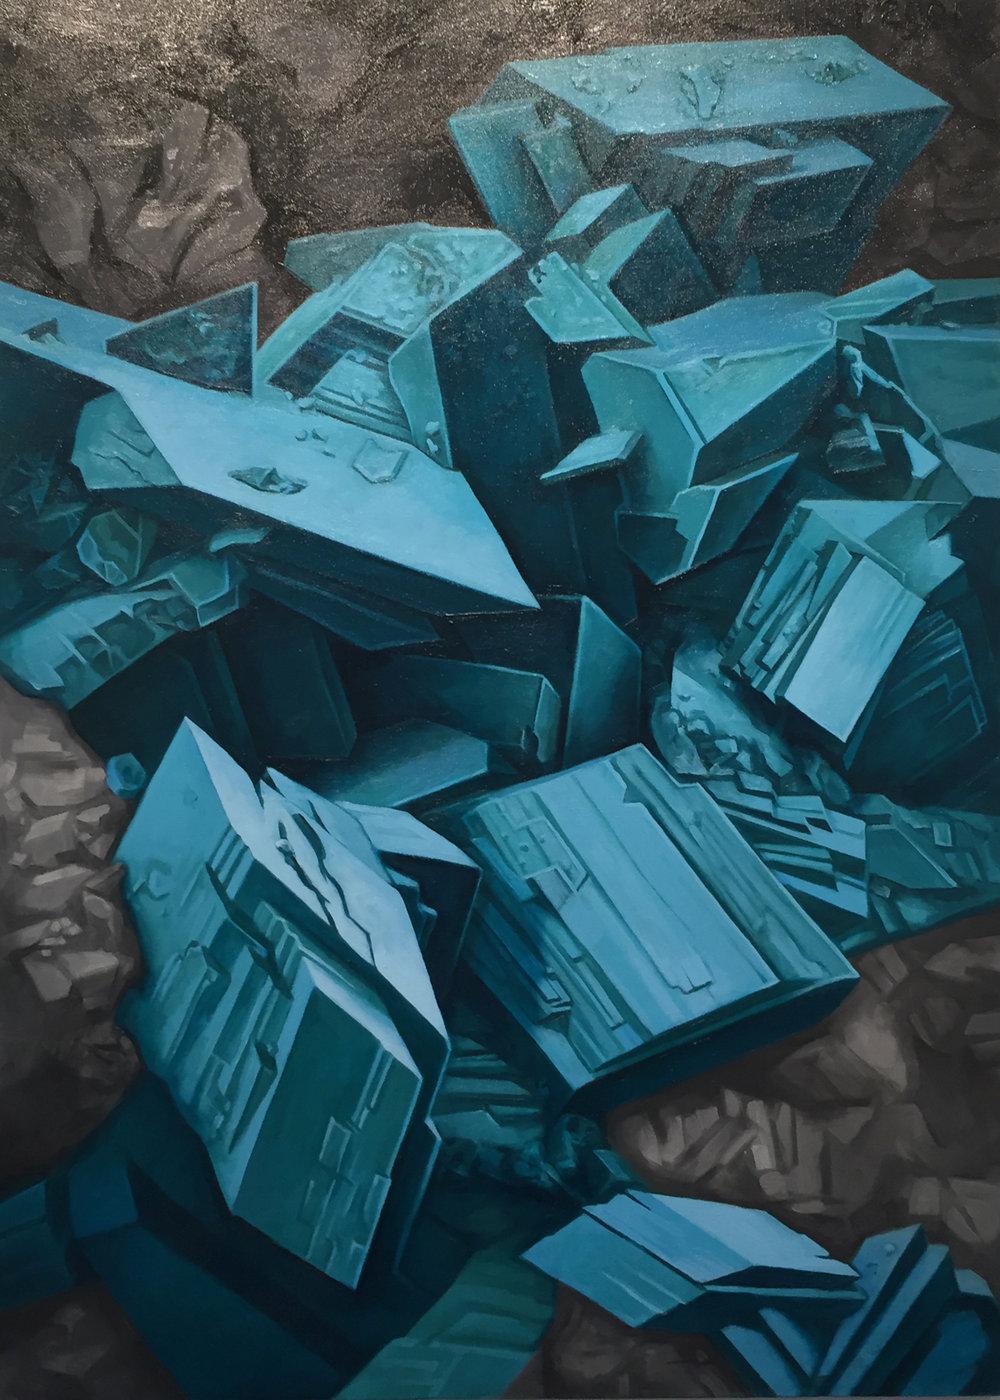 Turquoise Micro-Crystals   Saul Krotki